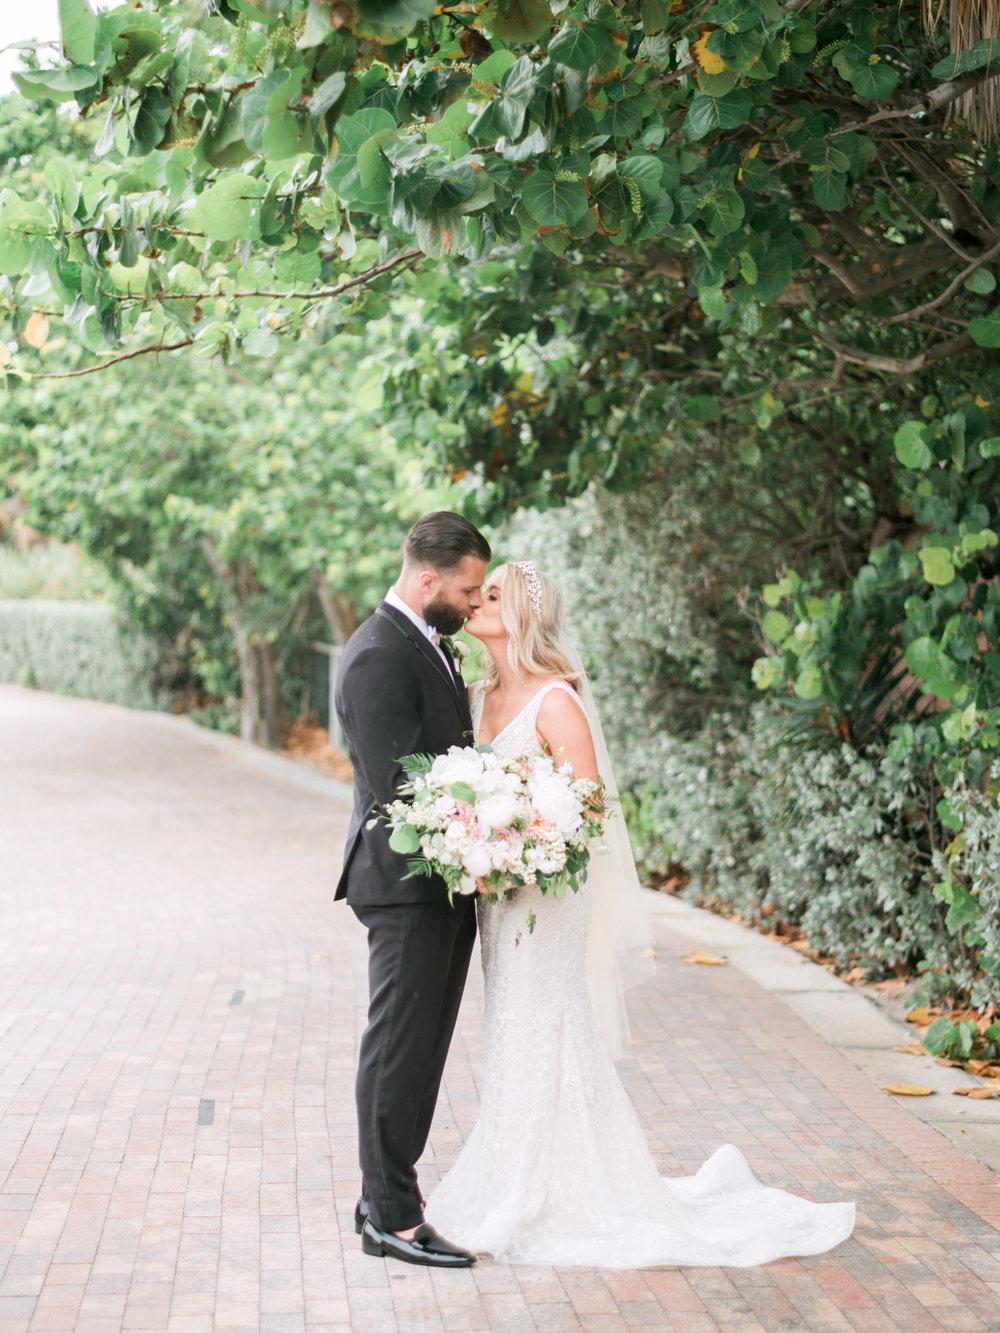 raleigh-miami-beach-destination-film-wedding-1144.jpg